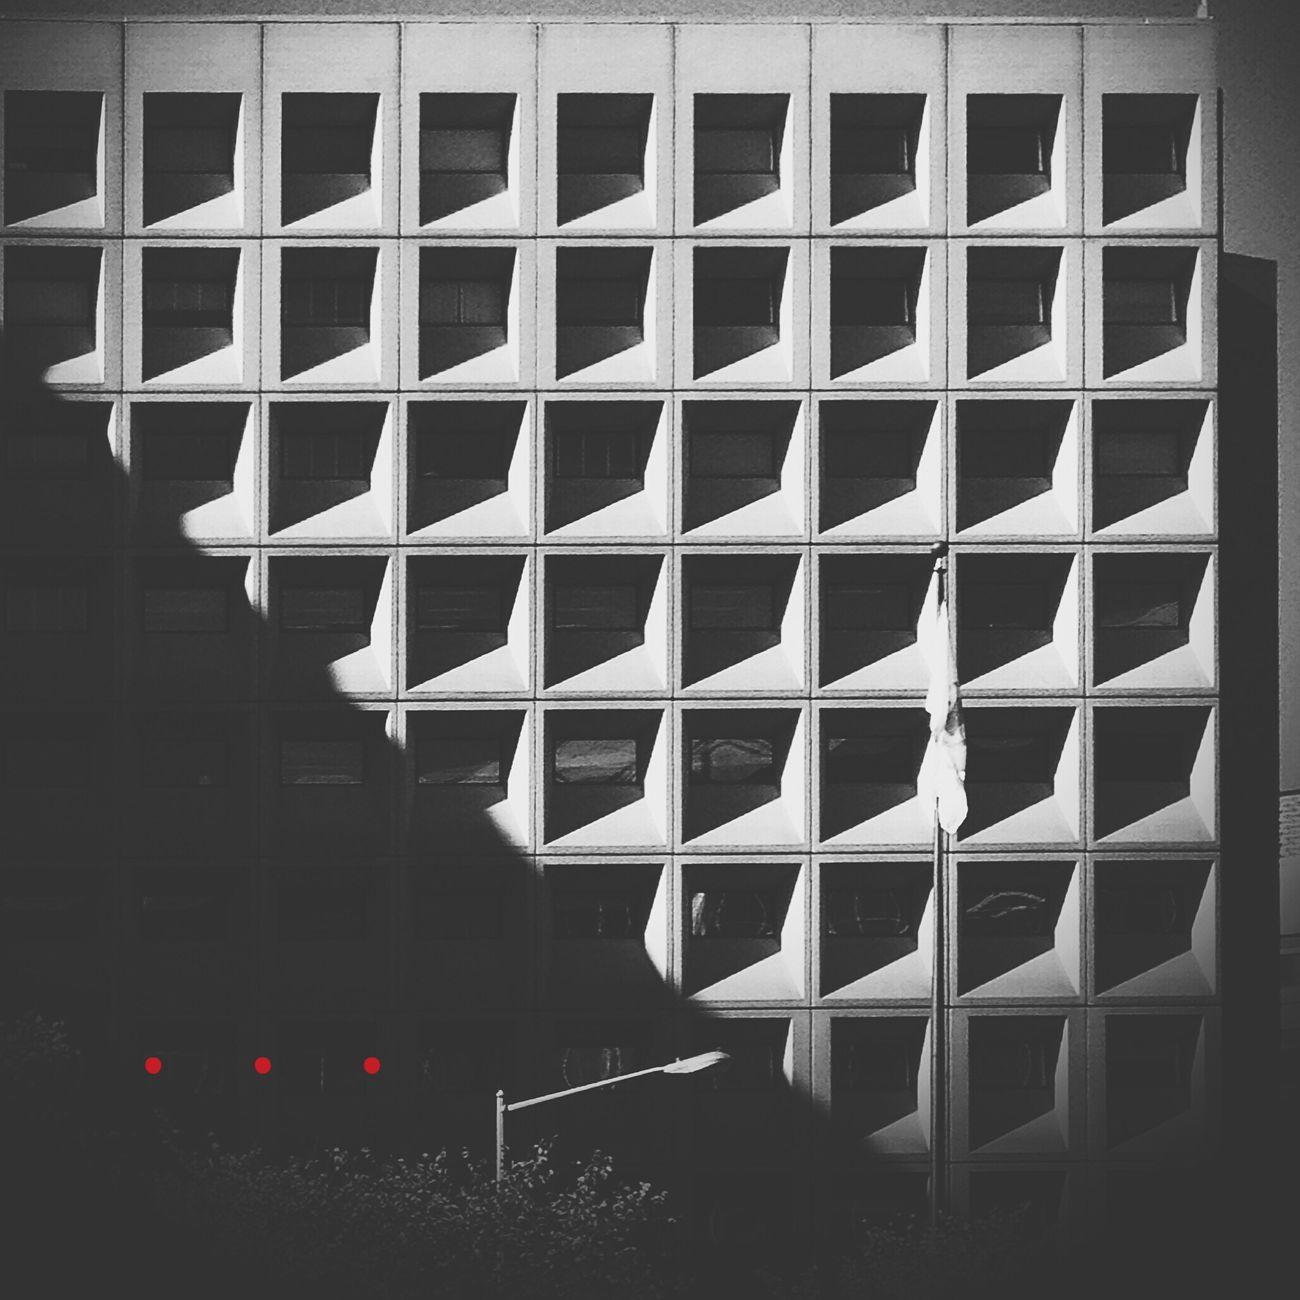 Architectural Detail Shootermag Architecture Blackandwhite Monochrome WashingtonDC